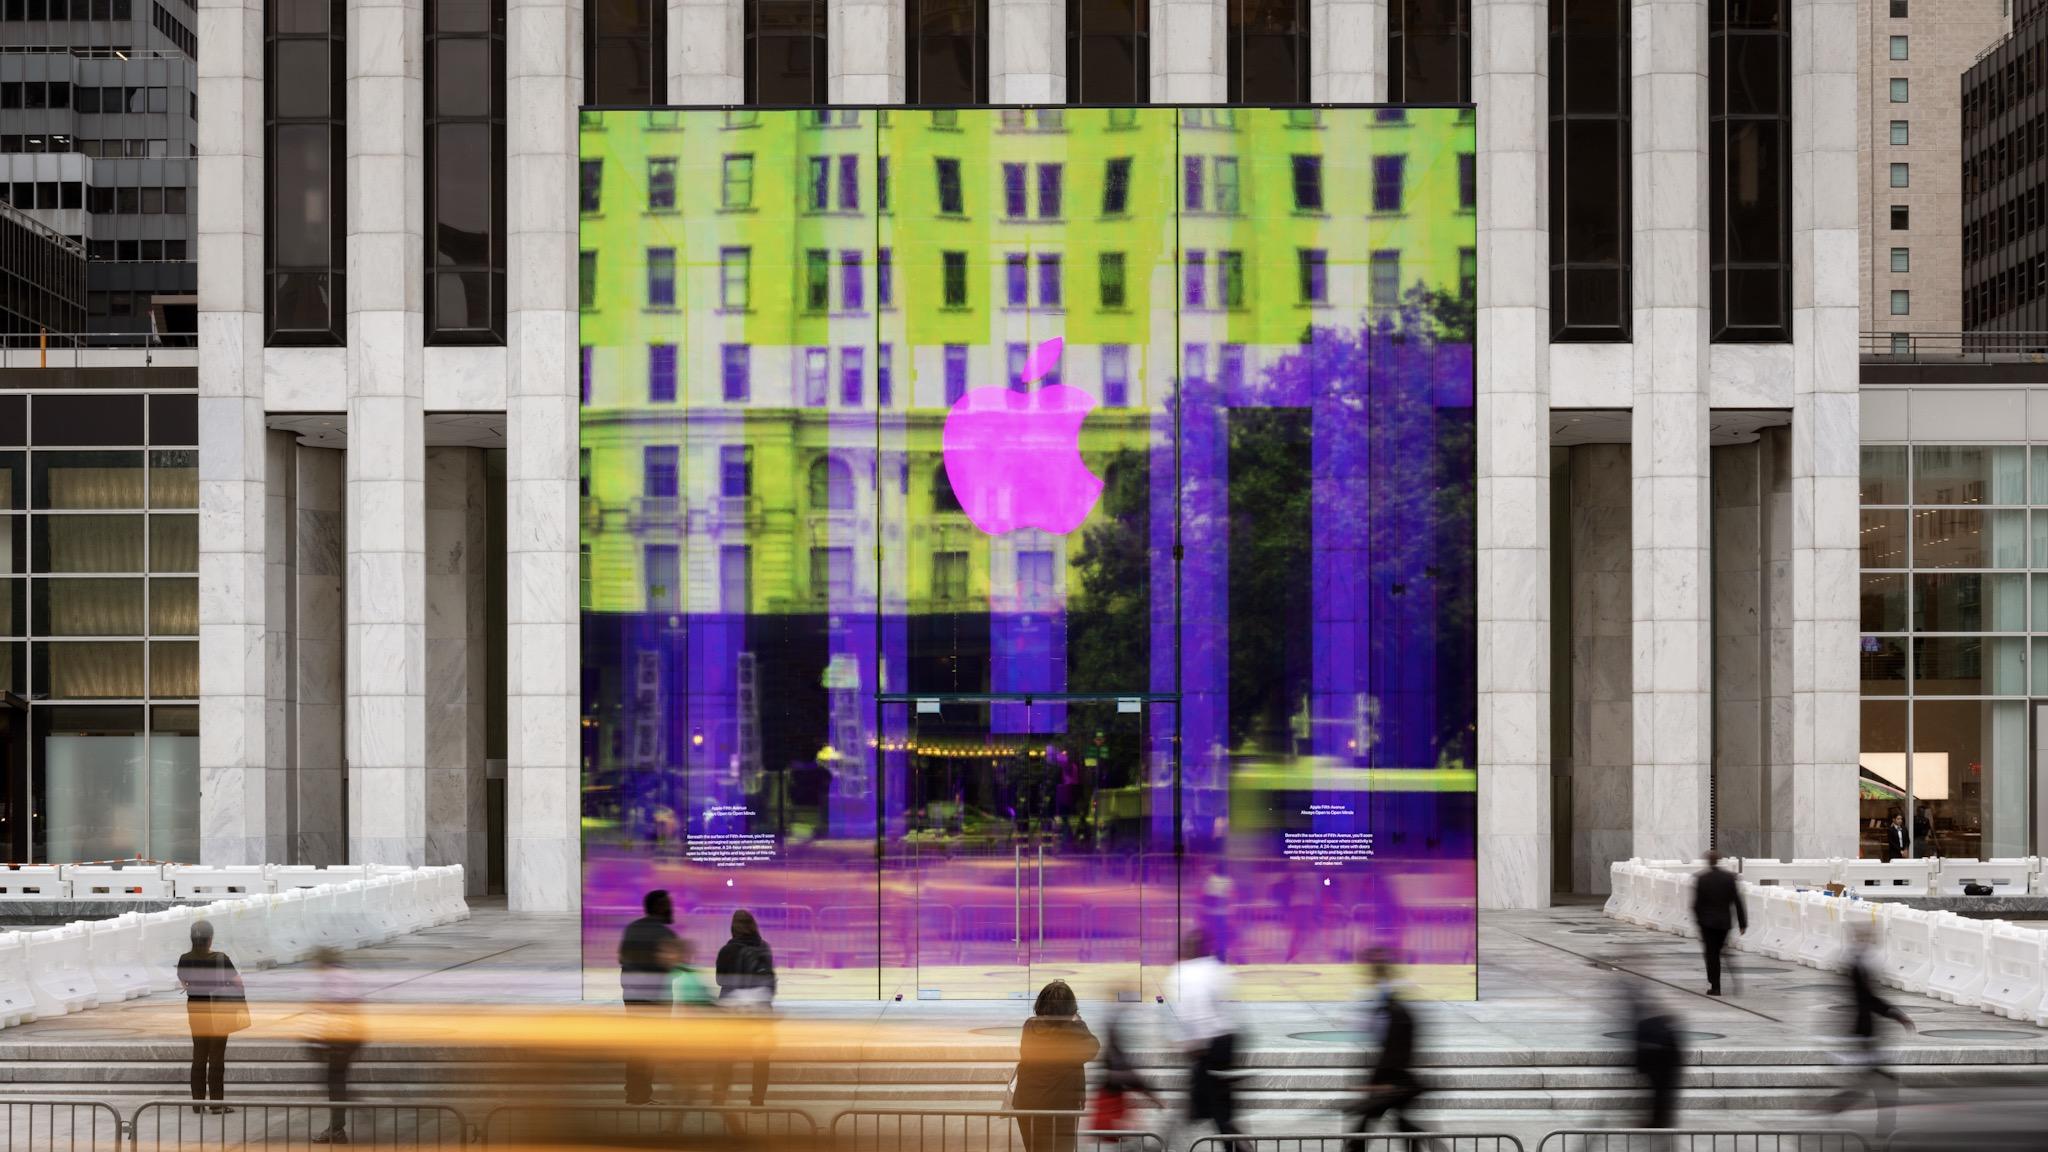 gesto Último Jabeth Wilson  Apple Fifth Avenue's reimagined glass cube opens soon - 9to5Mac